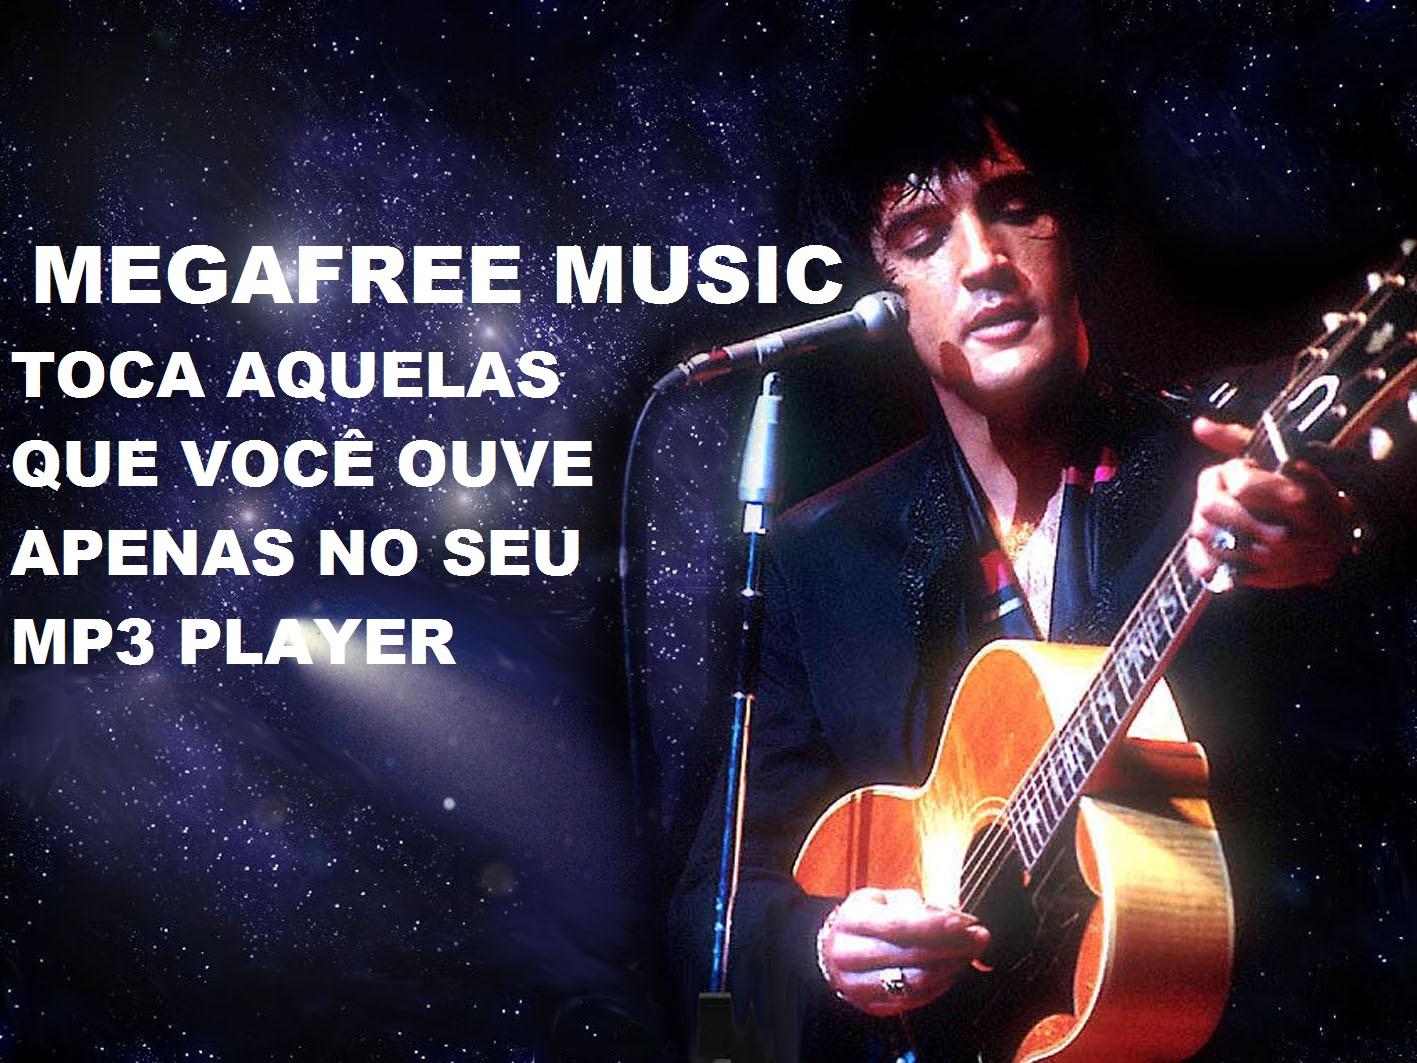 http://1.bp.blogspot.com/-CicpHmYsLXo/UEnkifa8reI/AAAAAAAAAyc/fkcZRkq_AMw/s1600/Elvis+Presley+(5).jpg